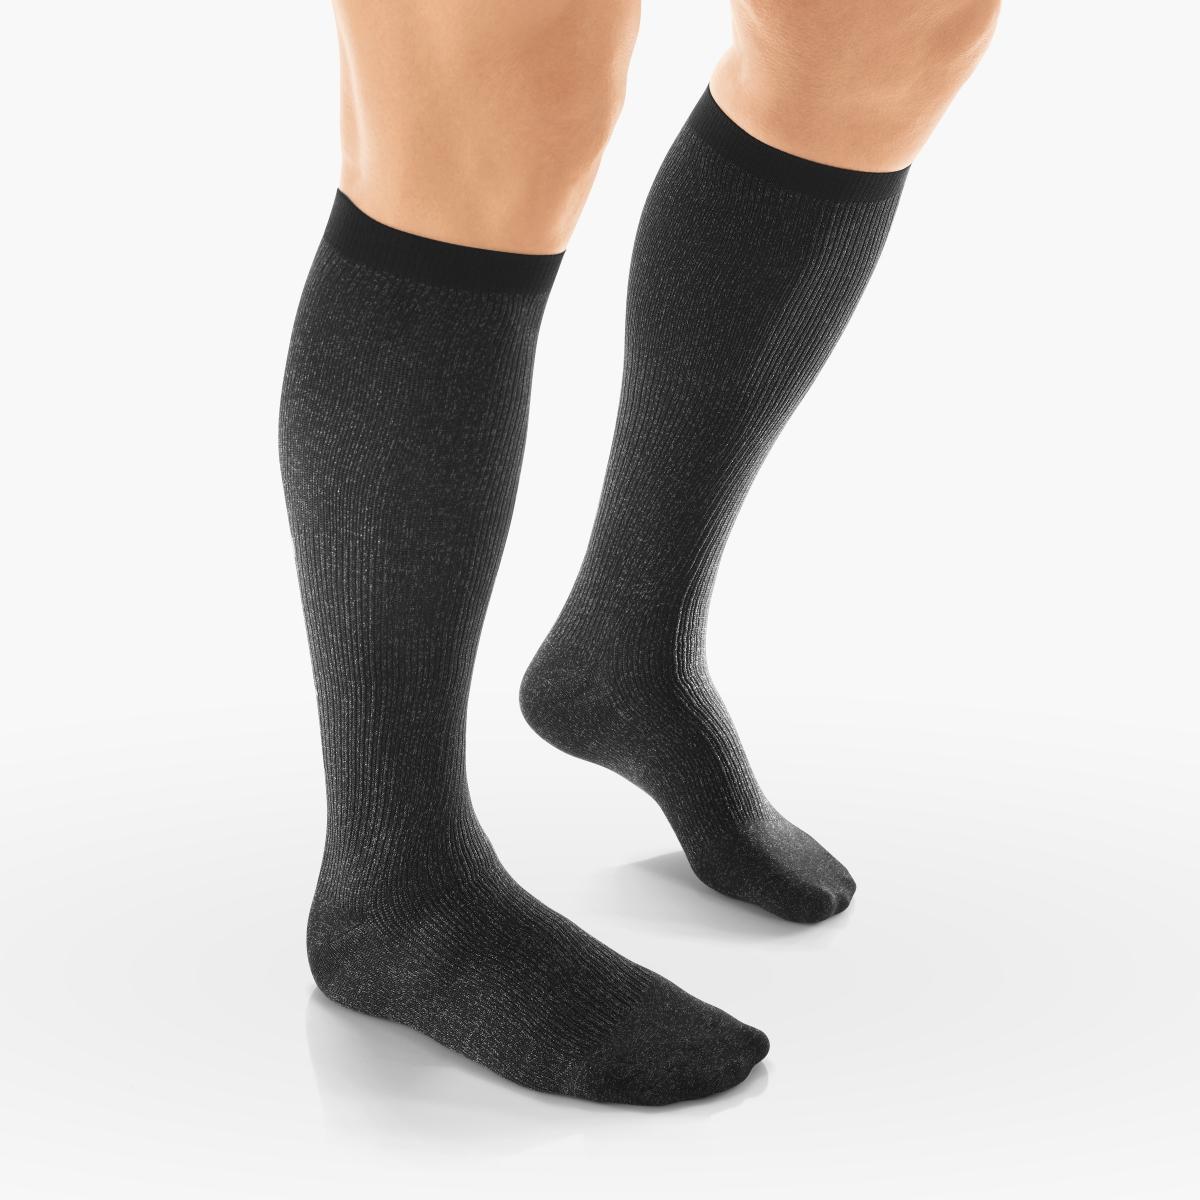 VENOSAN Silverline F Men, Below Knee 20-30, Black, S, Firm 20-30 mmHg | Black | S |  | Closed Toe | Knit Top